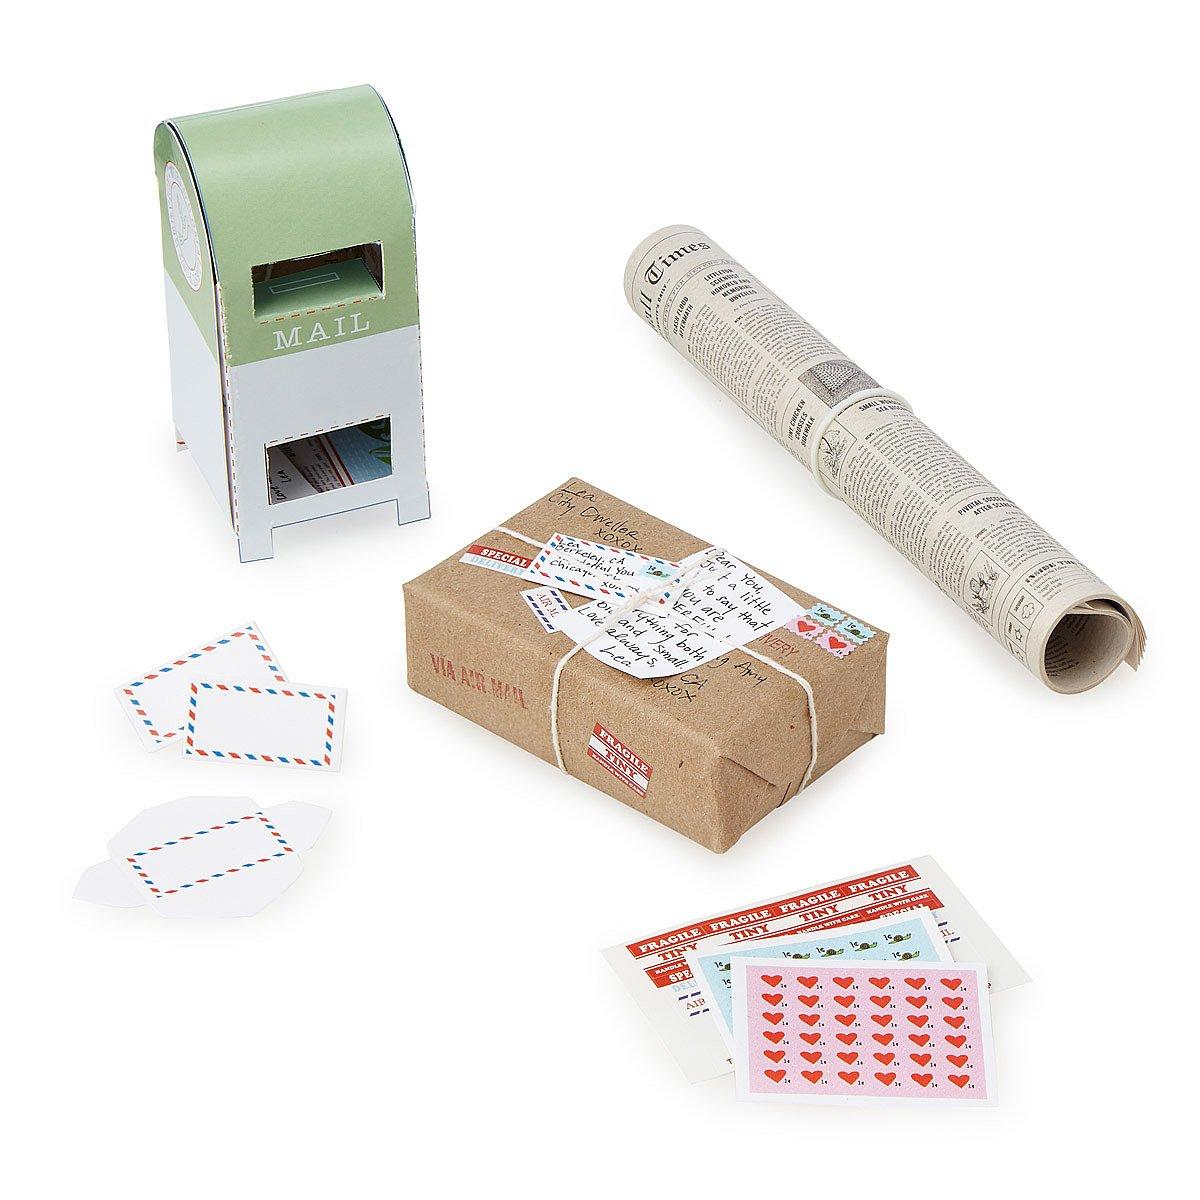 Tiny Mail Kit